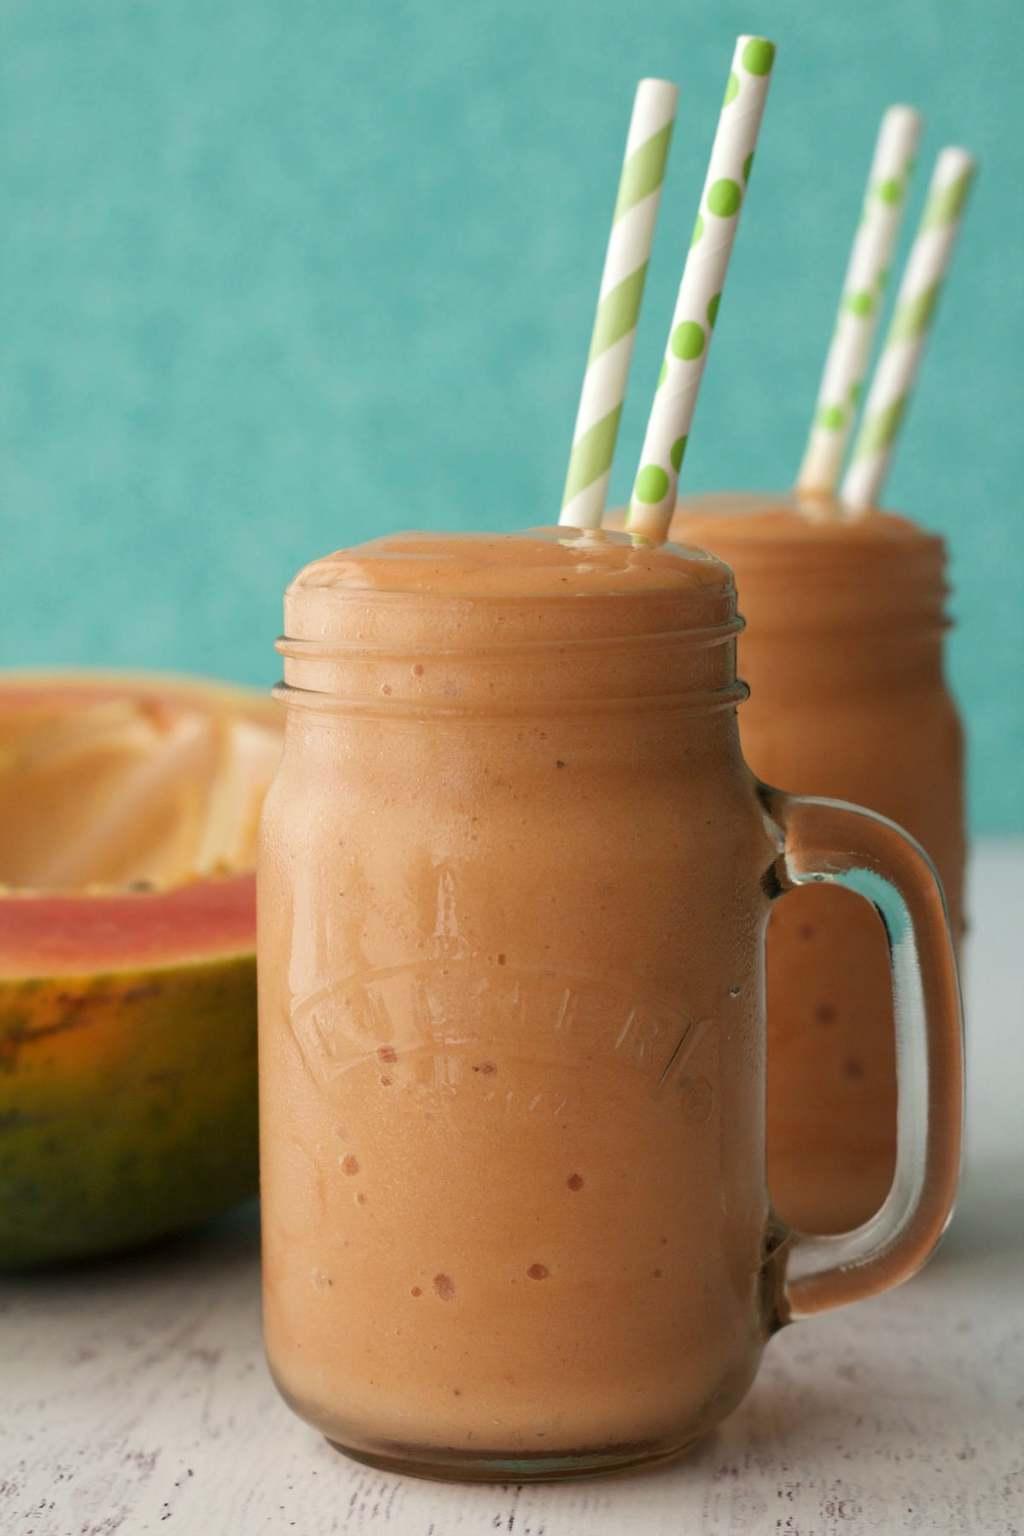 Double-Thick Papaya Smoothie #vegan #lovingitvegan #smoothie #papayasmoothie